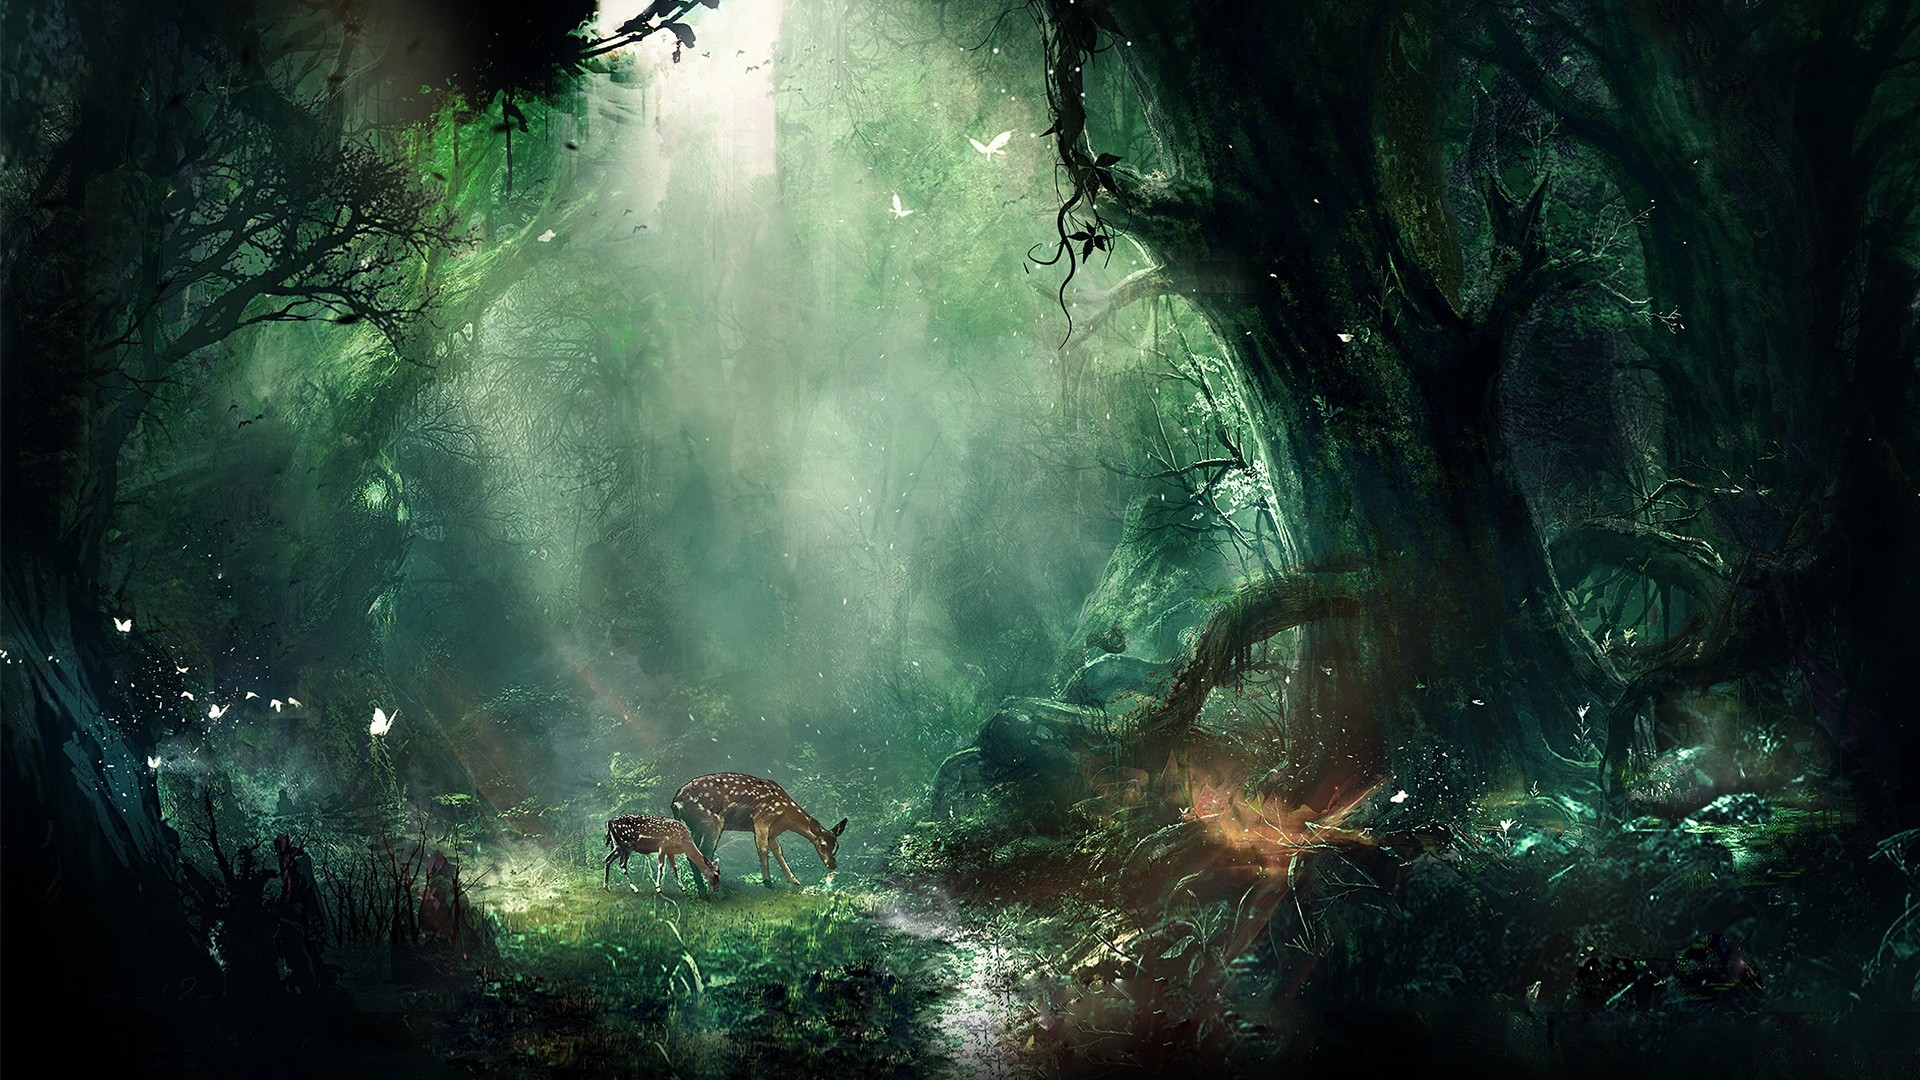 Fantasy Wallpapers For Desktop 79 Pictures